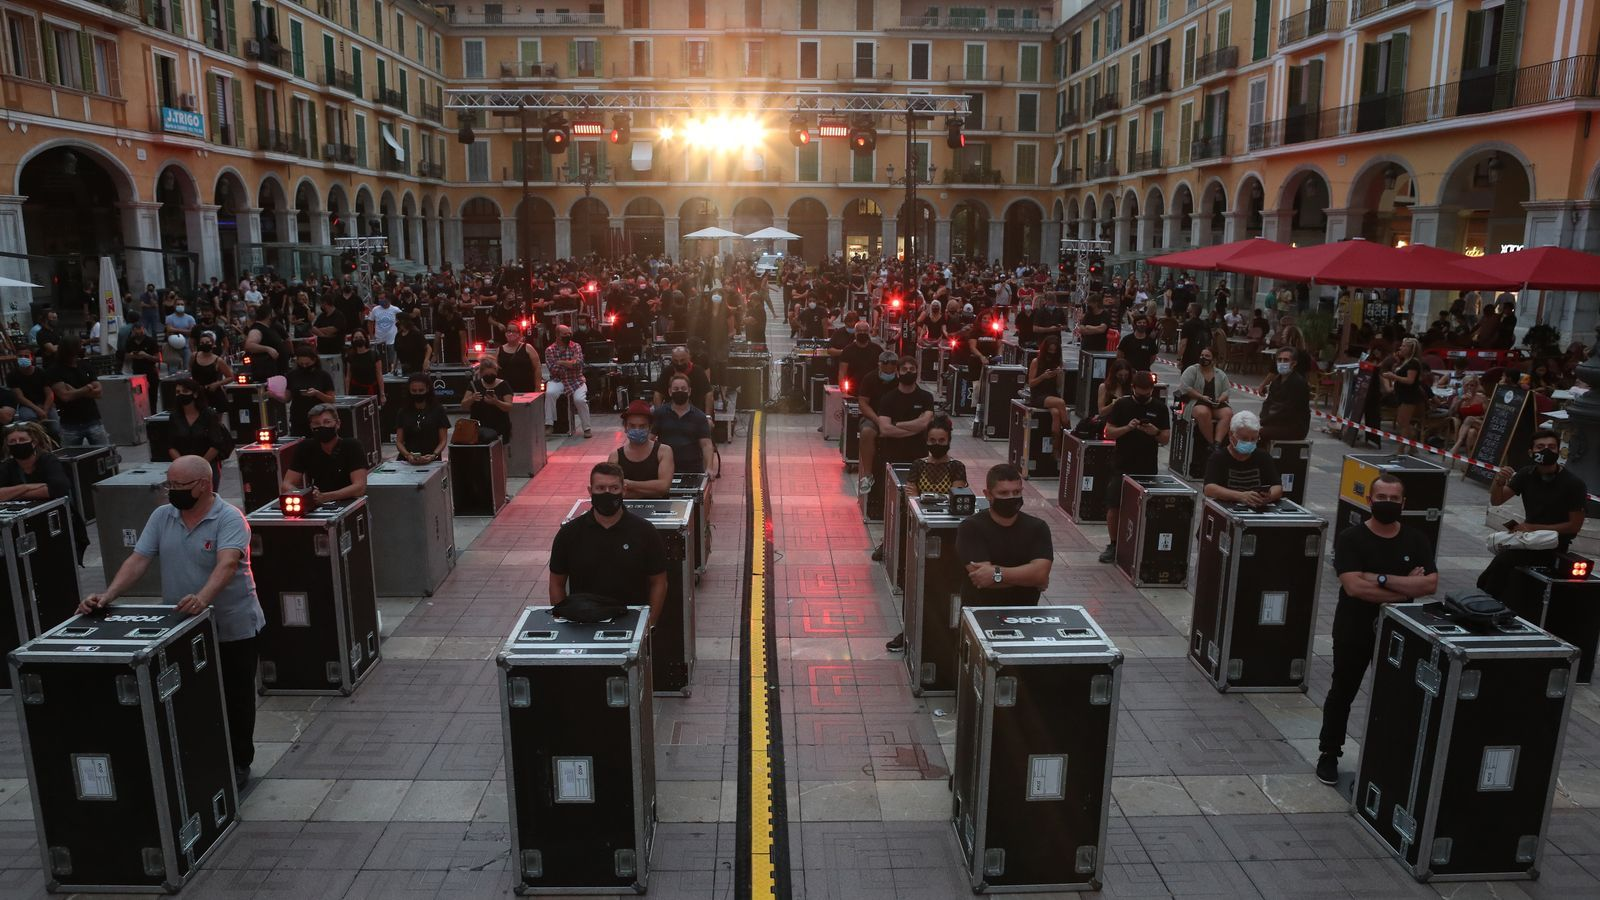 Artistes de les Illes es manifesten a la plaça Major